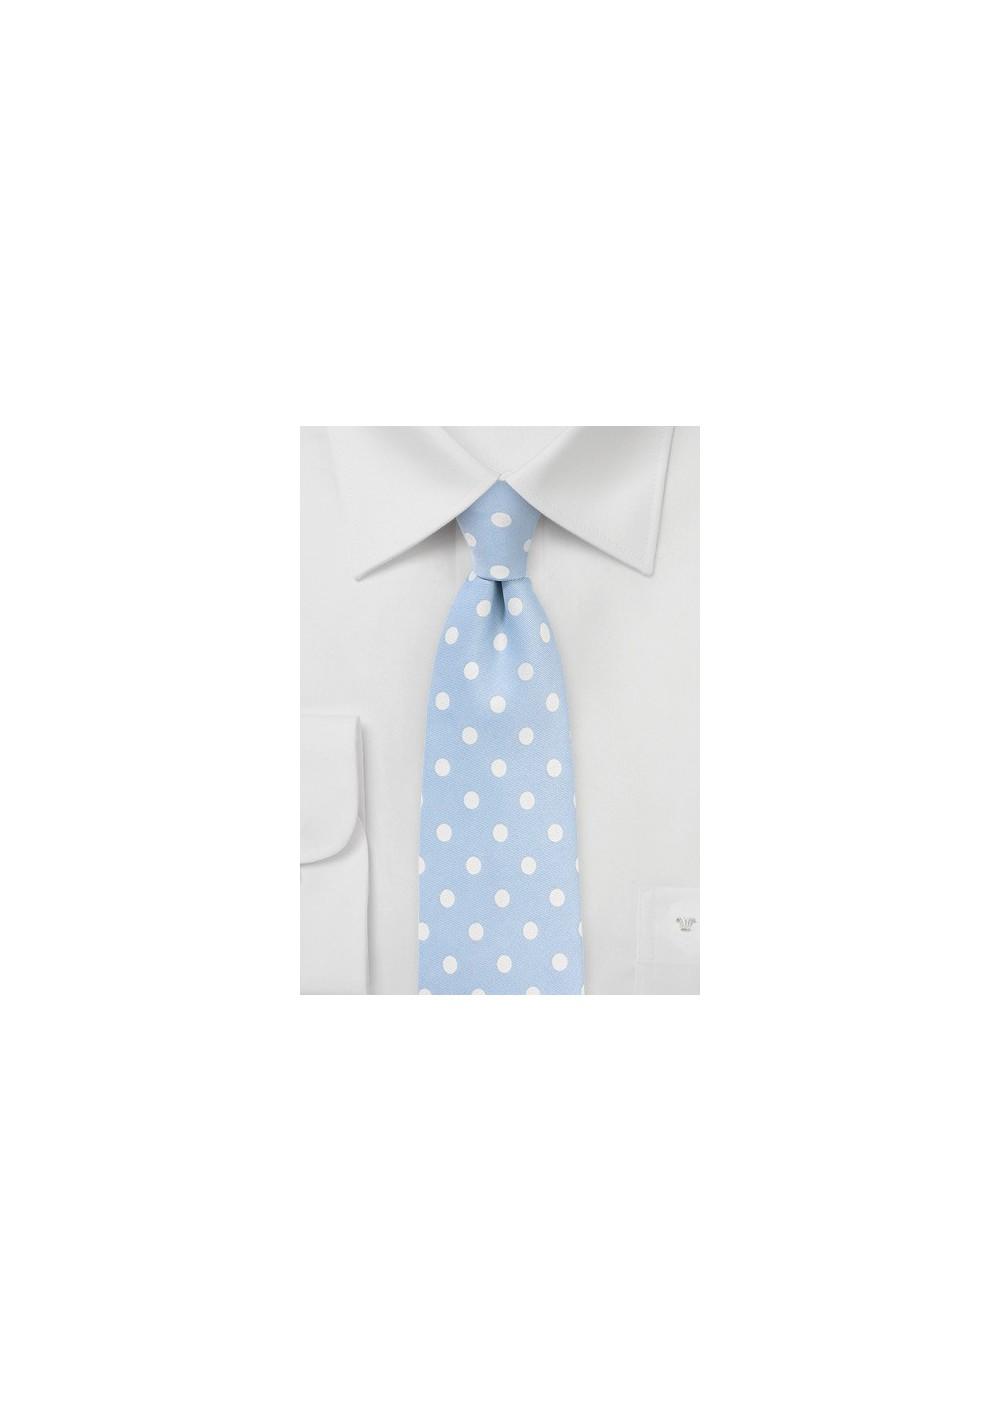 Powder Blue and White Polka Dot Tie